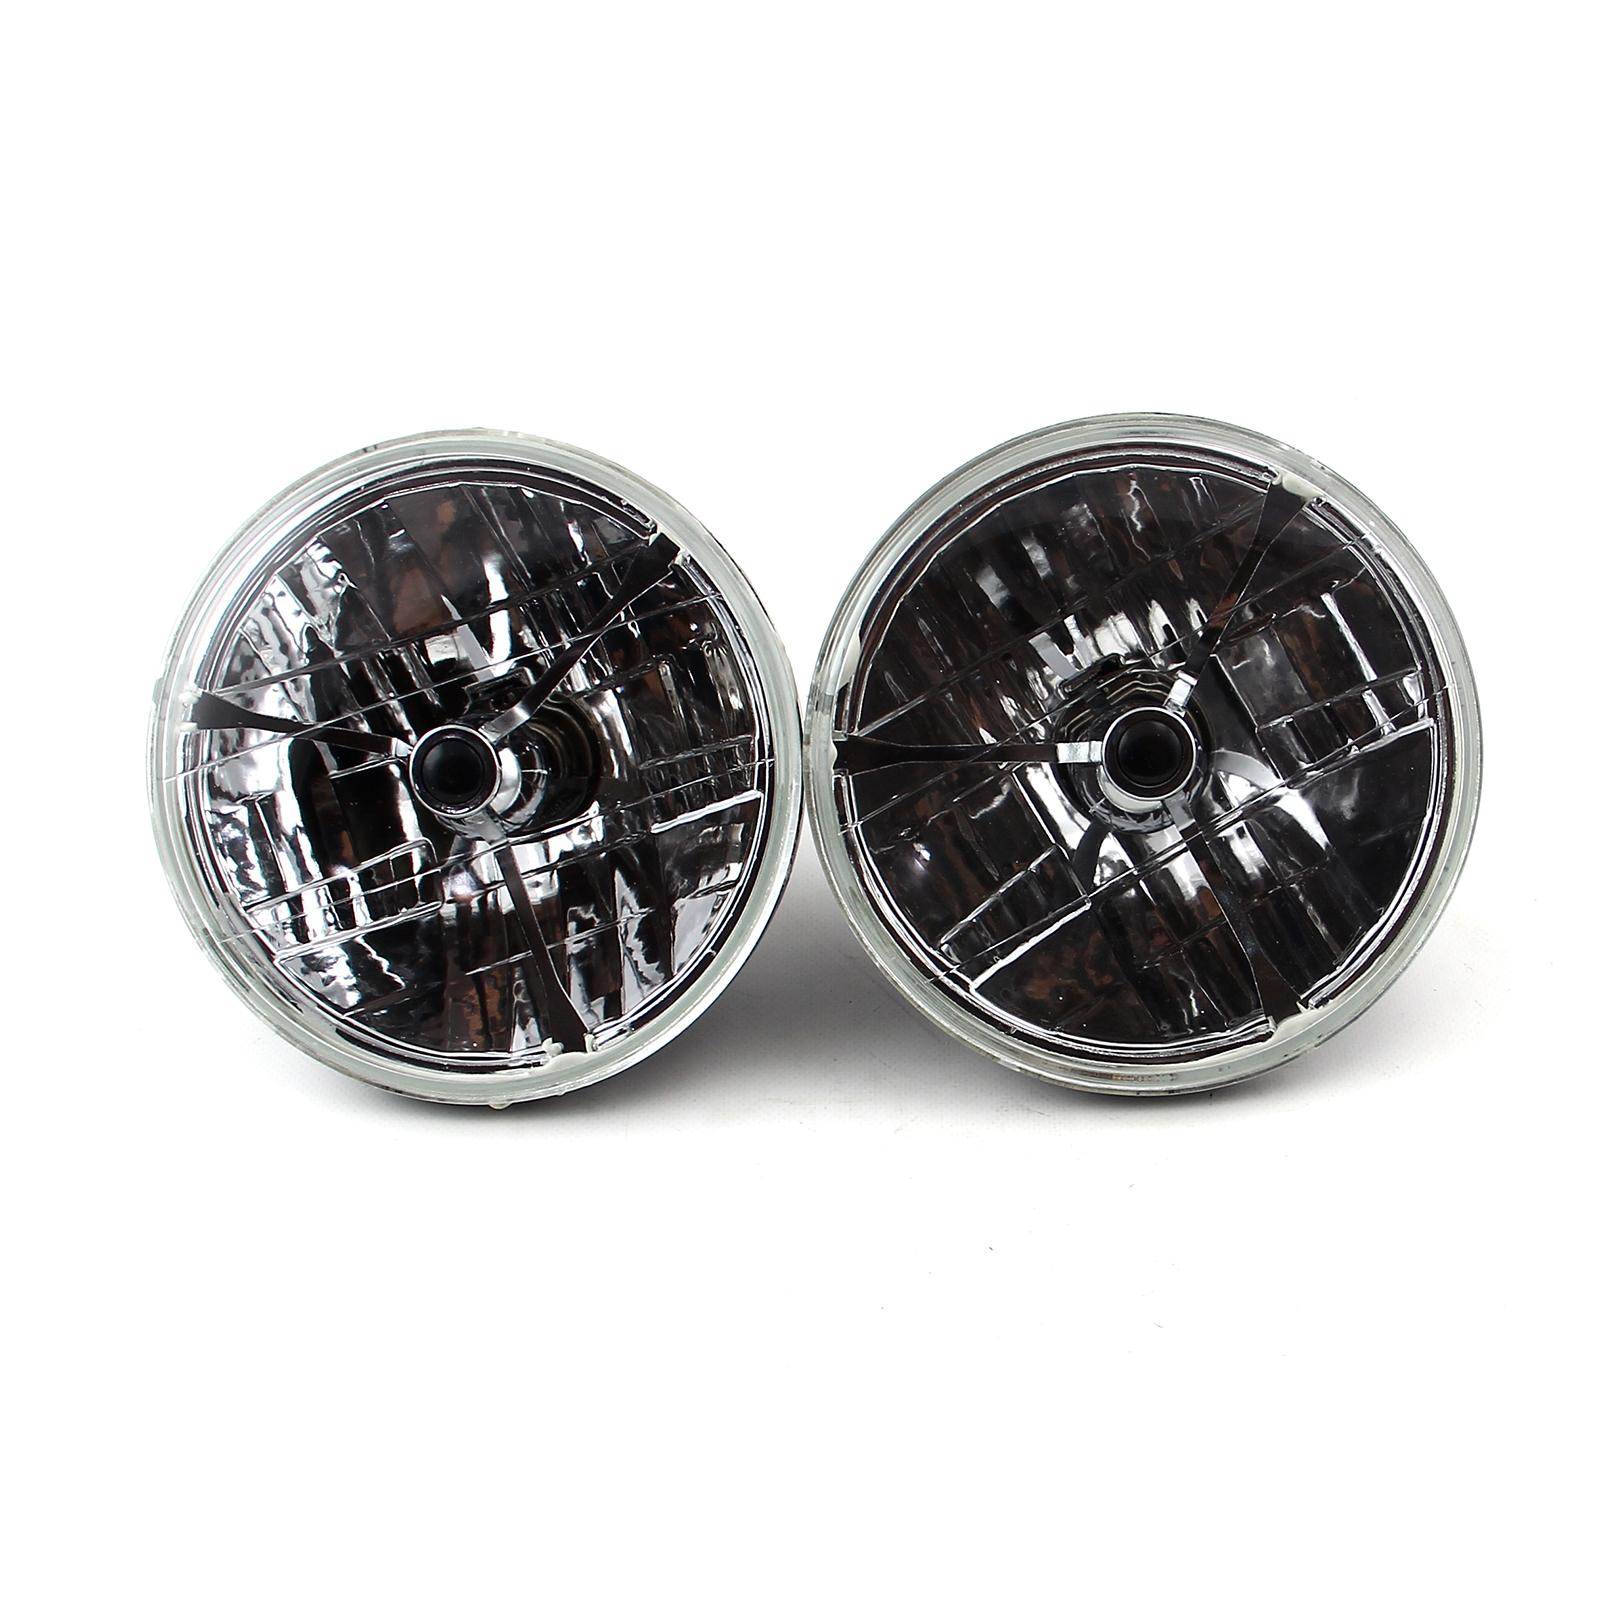 "7"" Multi Reflex Headlight H4 55/60W w/Tri Bar # Black Dot"